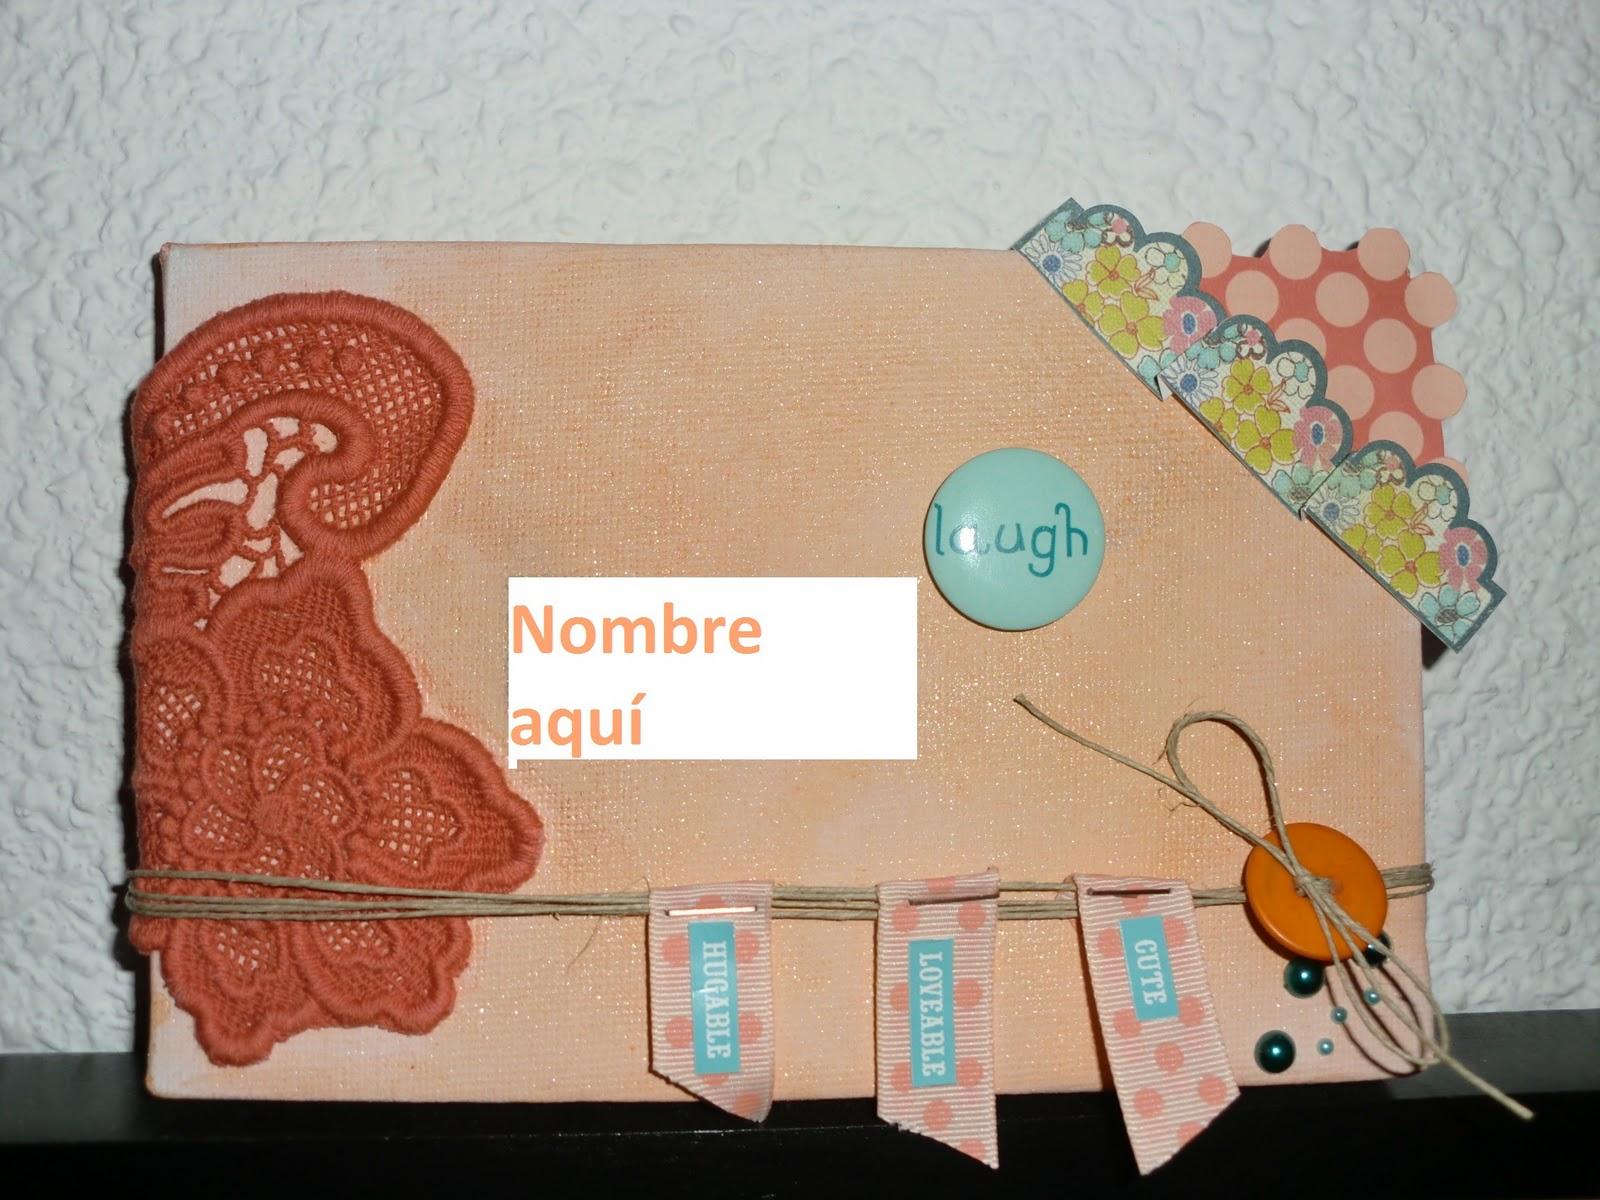 Cuadros personalizados para ni os hwl handmade with love - Cuadros para ninos personalizados ...